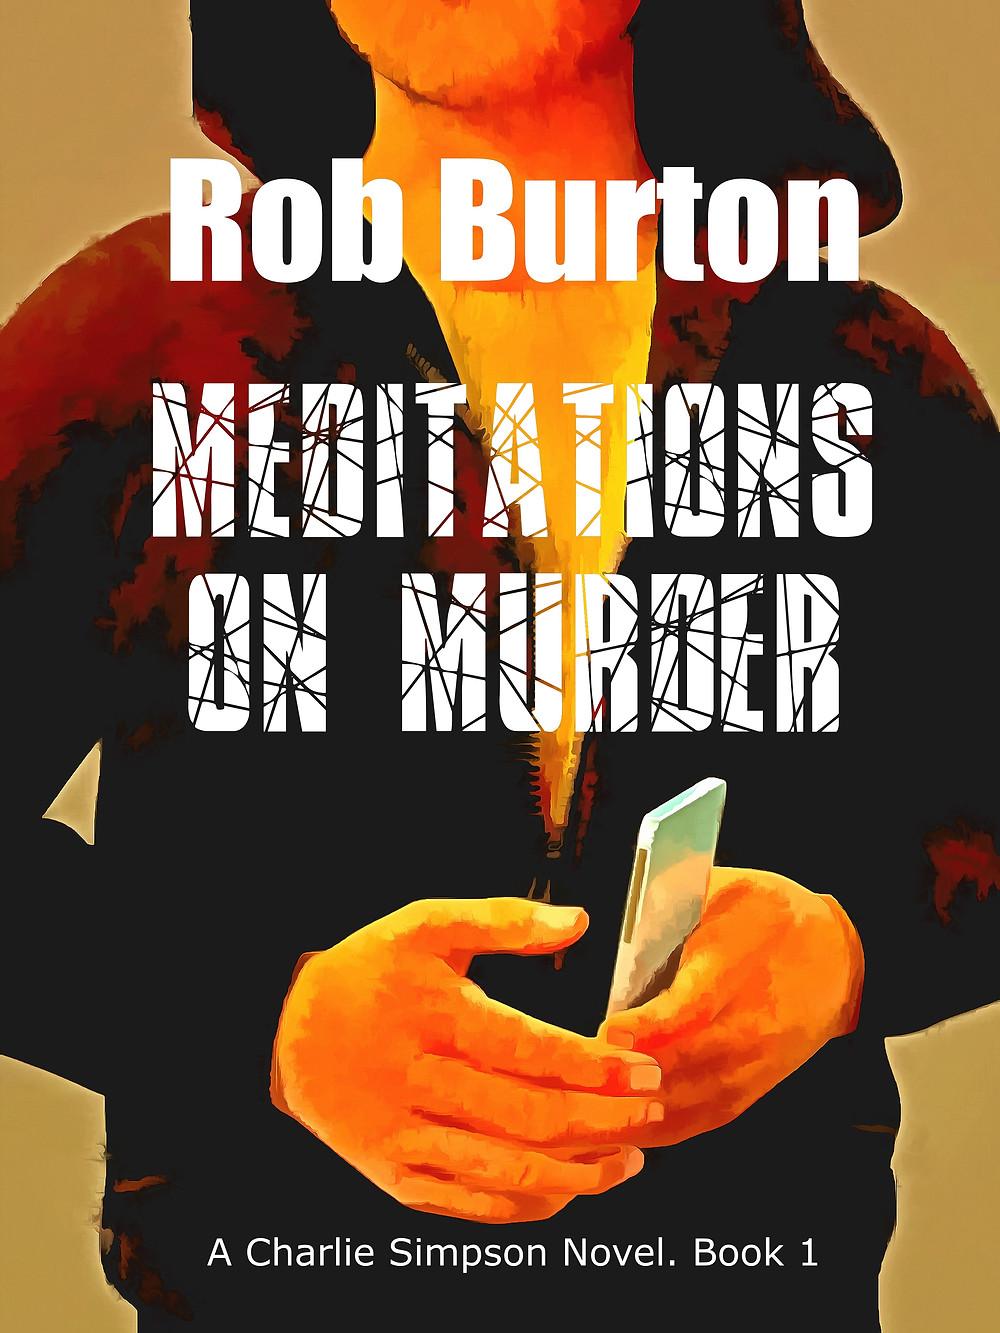 Meditations on Murder Amazon link